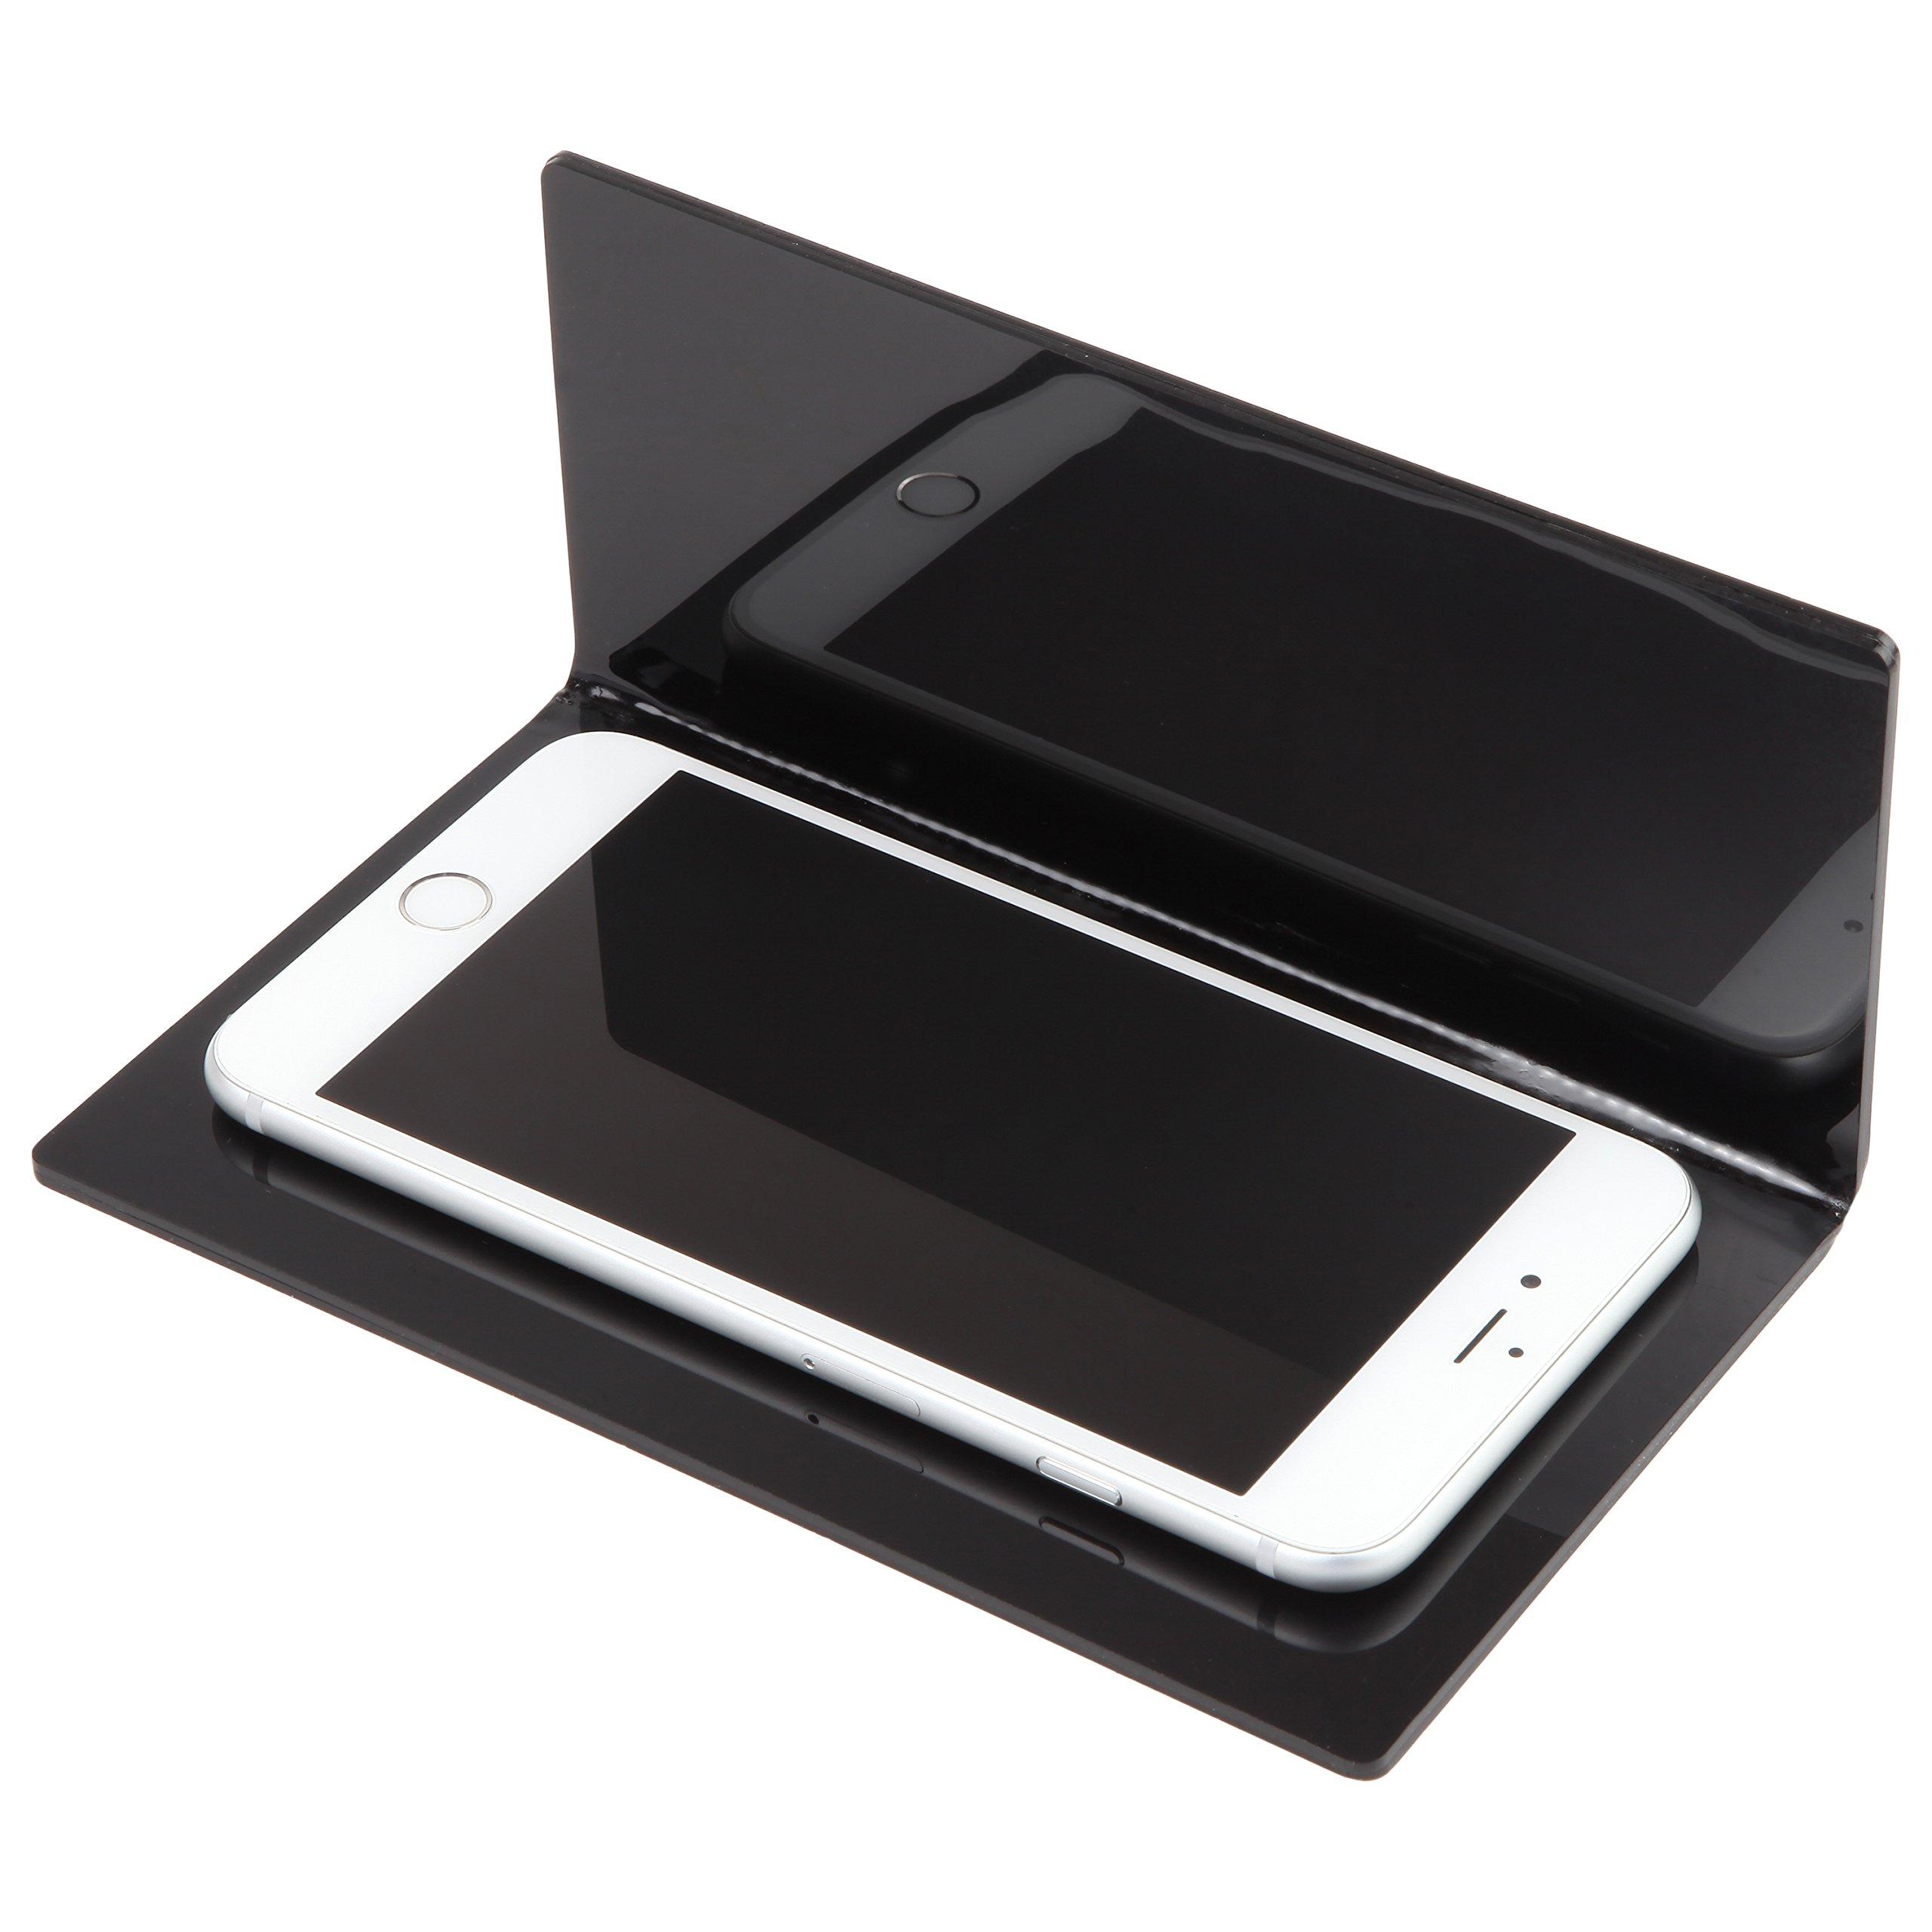 Cell Phone Sleep Shield - EMF Radiation Shield - HARApad EMF Protection by HARApad (Image #4)